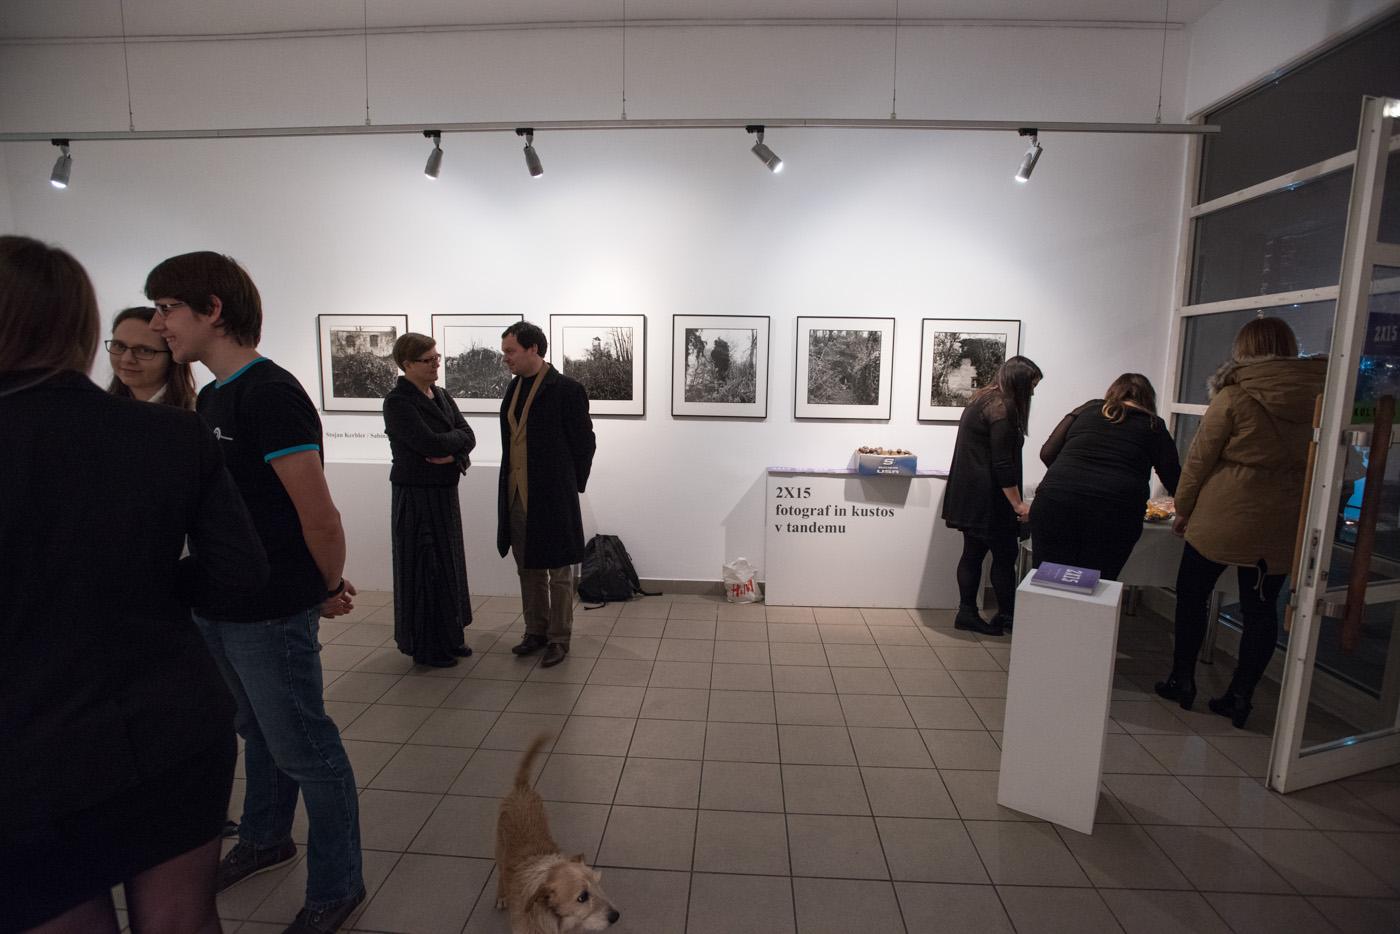 fotograf in kustus-MediaNox-Maribor-16.jpg